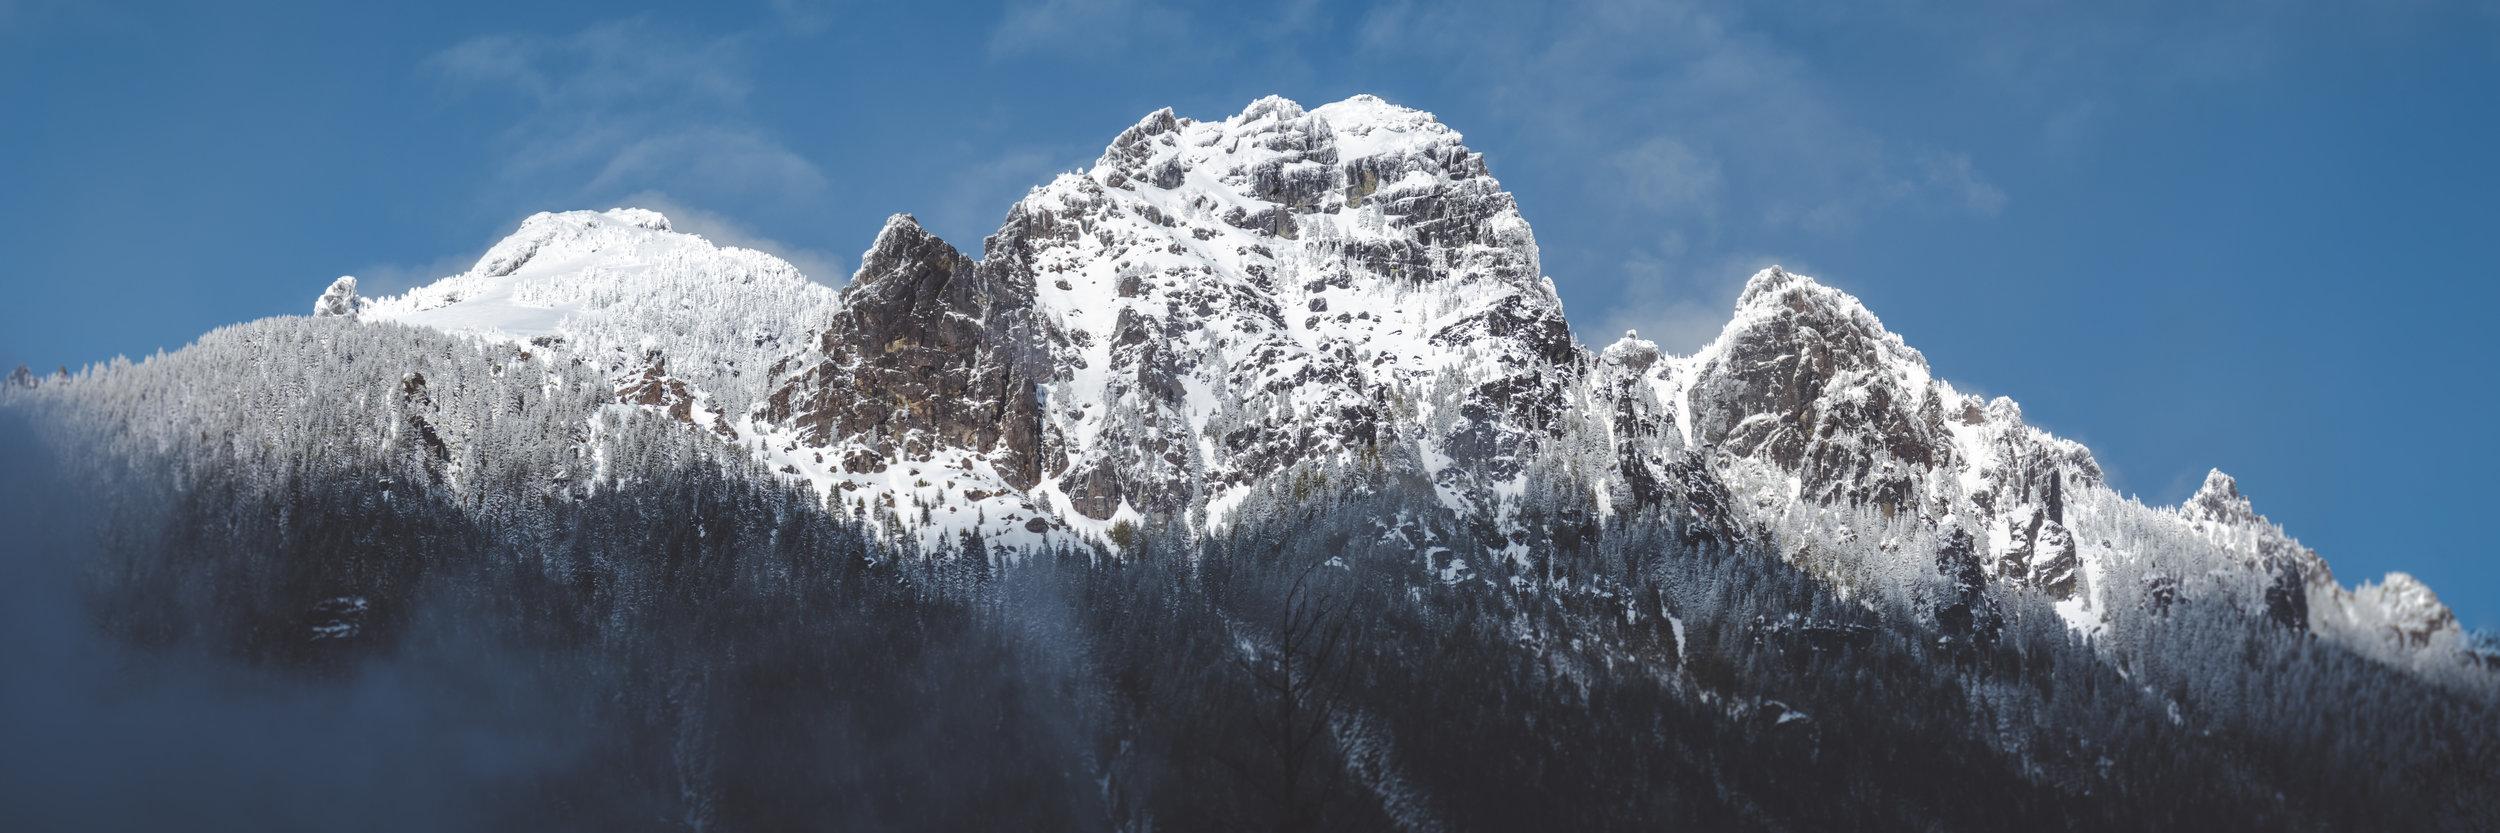 Snowy_Mountain_Cliffs_and_Blue_Sky_Panorama.jpg